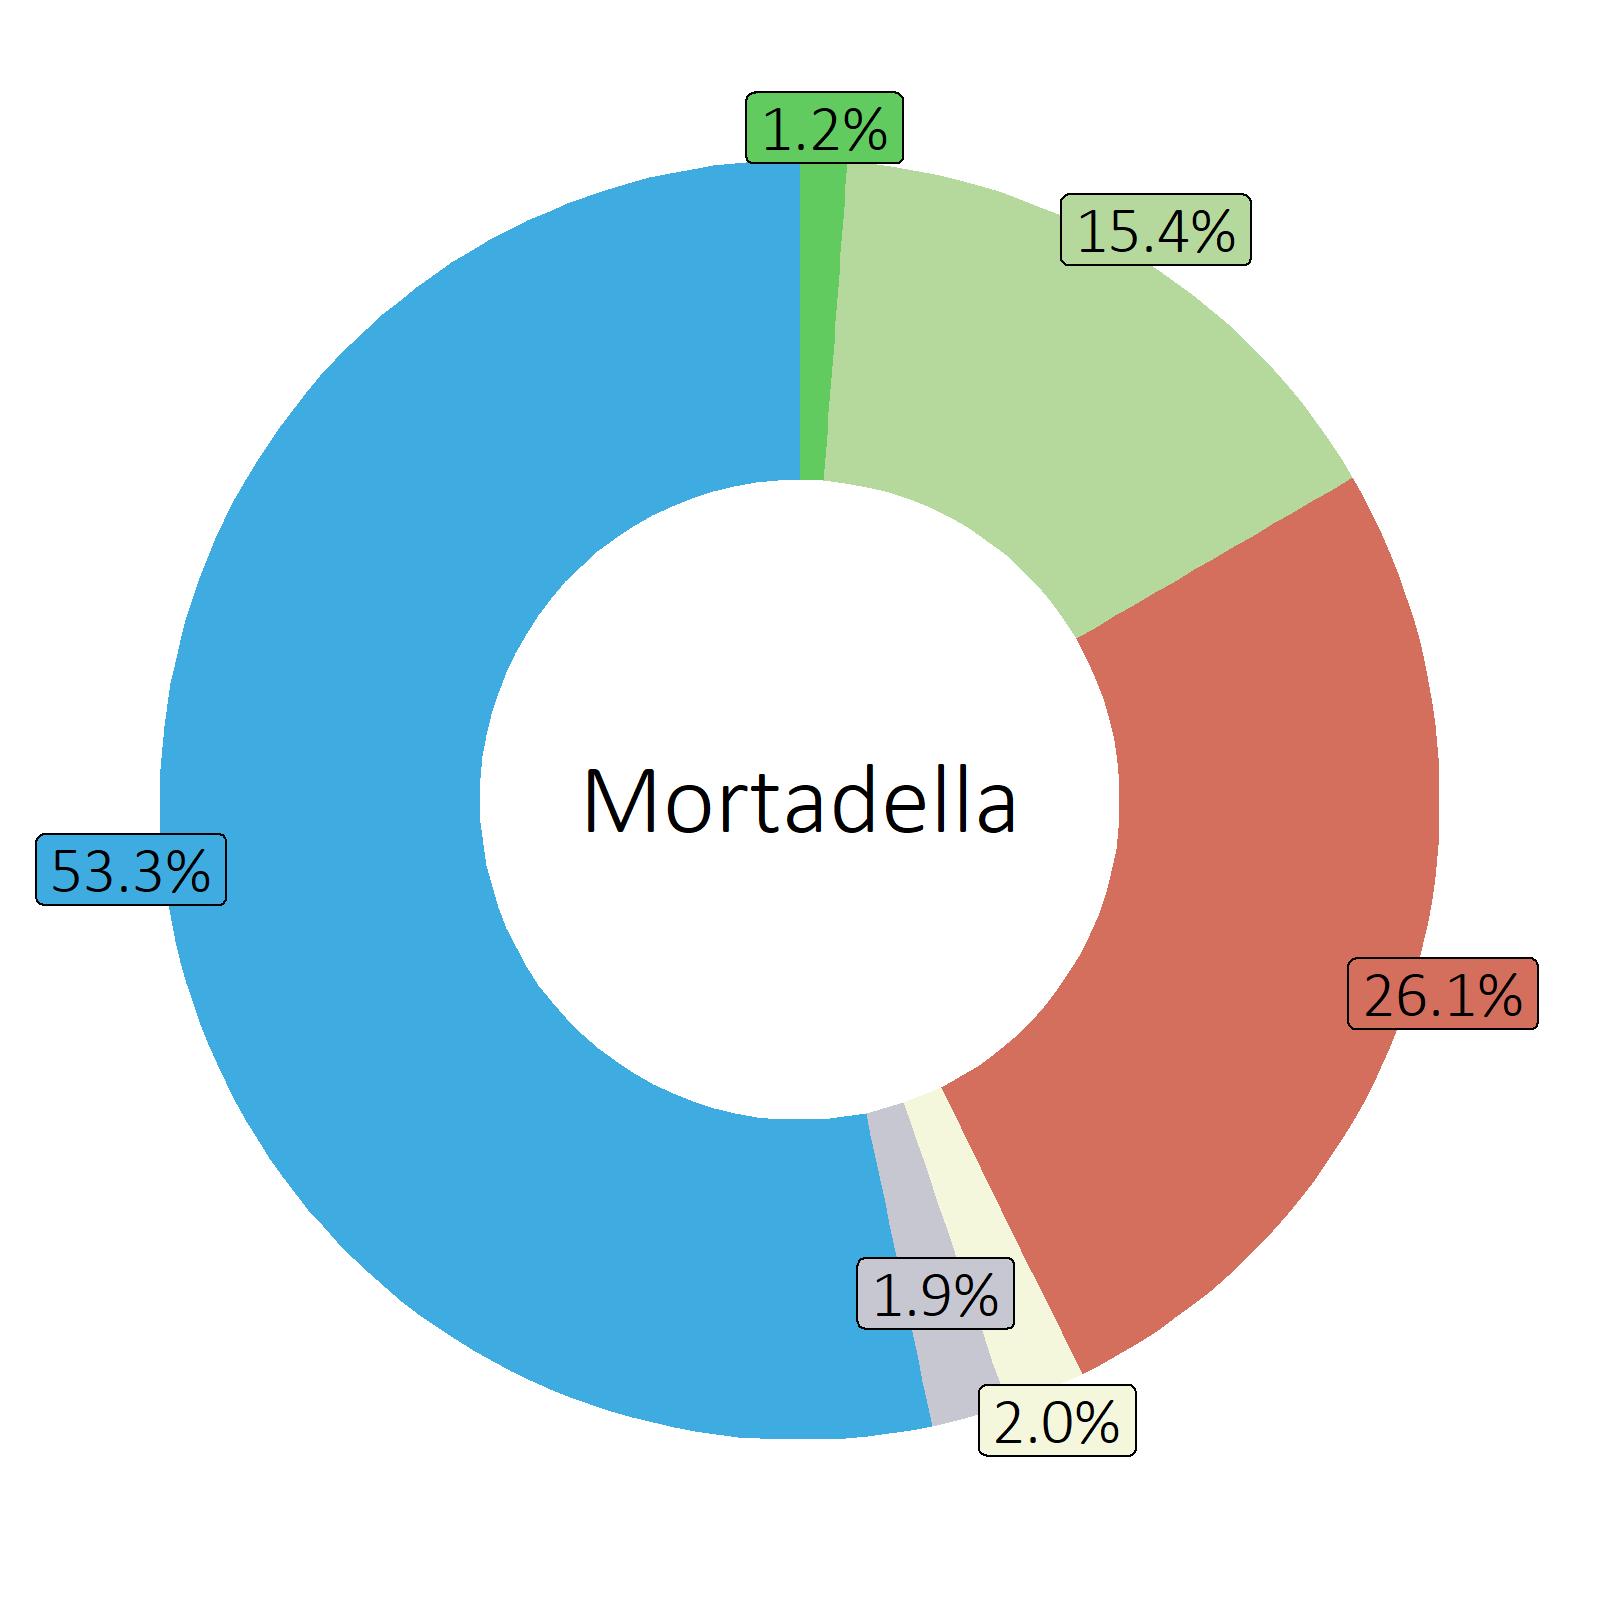 Bestandteile Mortadella